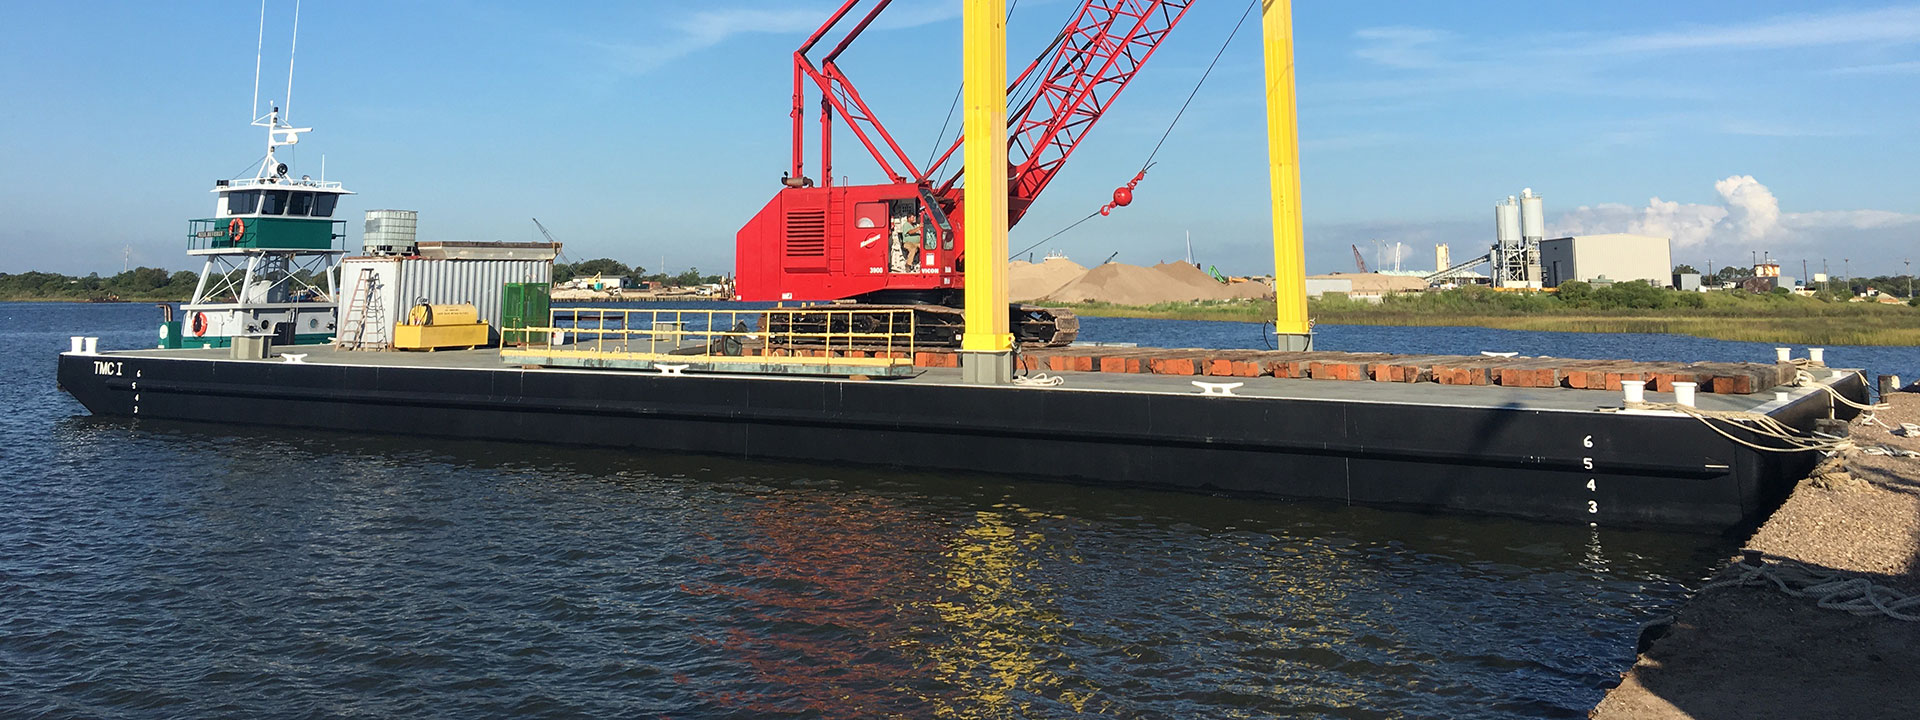 Barges - Taylor Marine Construction Inc